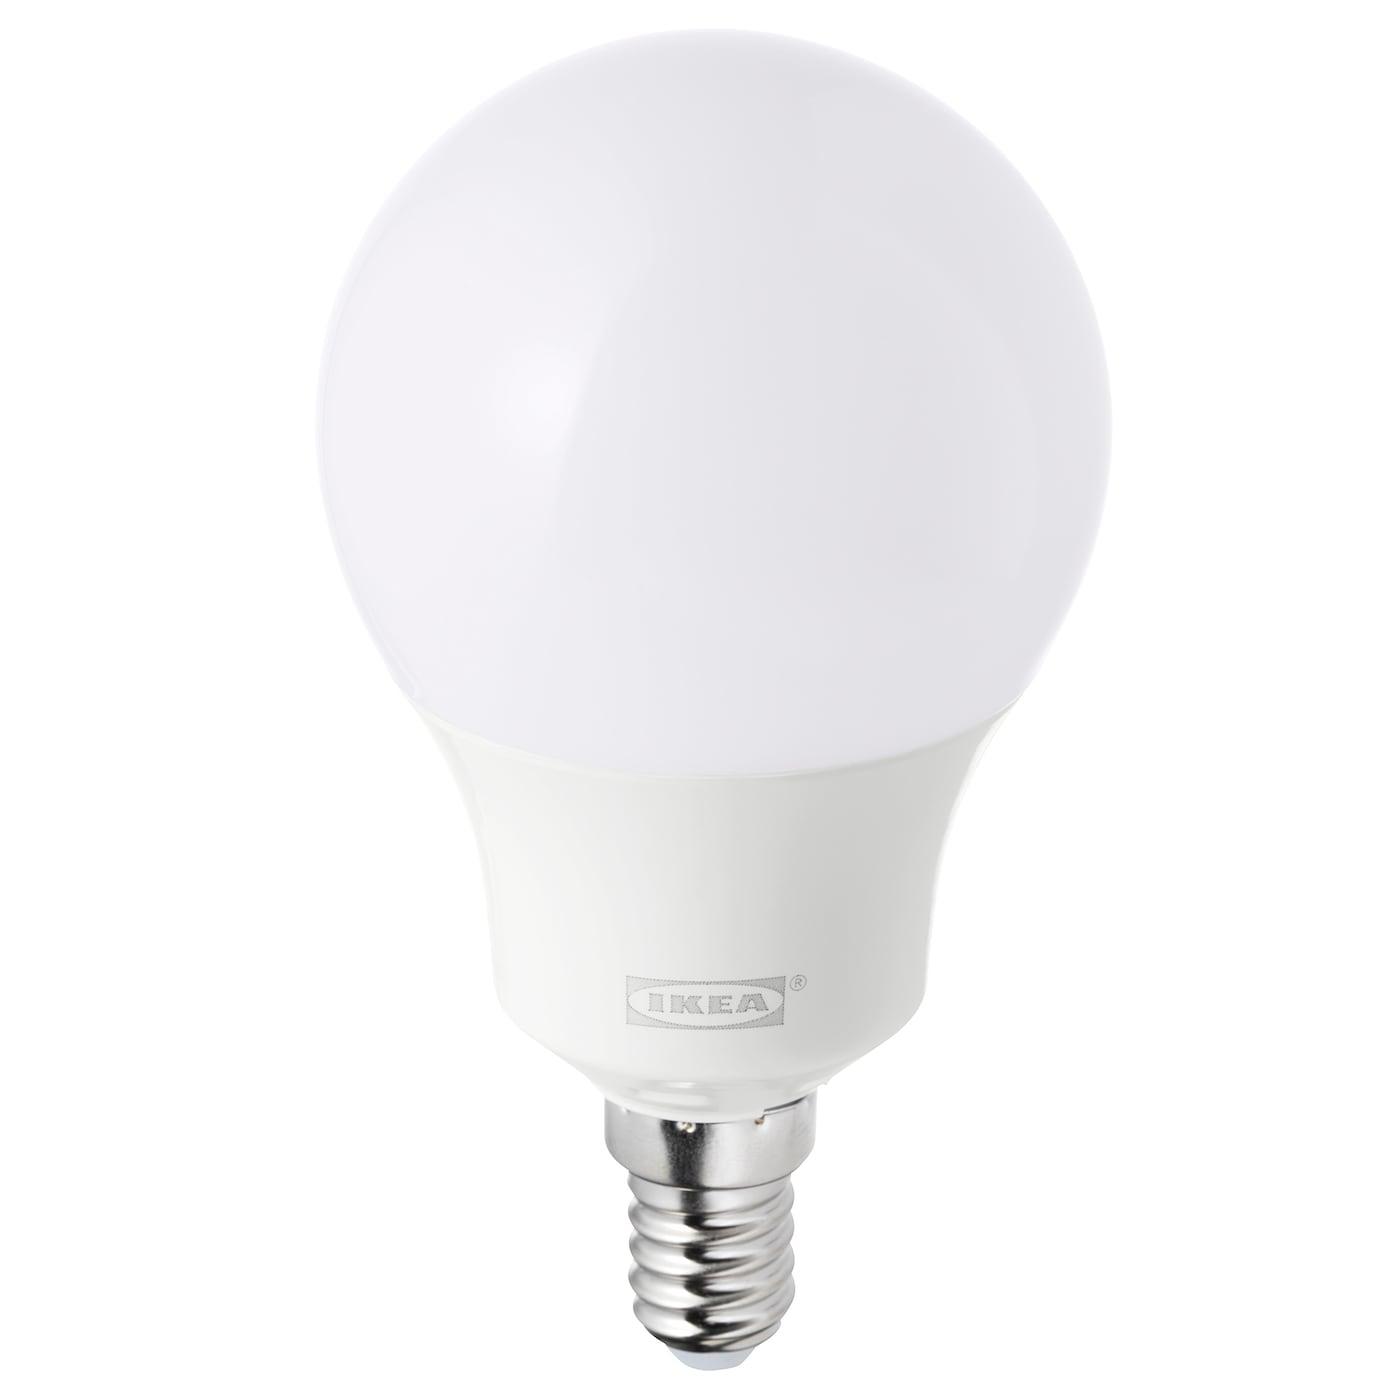 tr dfri led lamp gu10 400 lumen draadloos dimbaar wit spectrum ikea. Black Bedroom Furniture Sets. Home Design Ideas